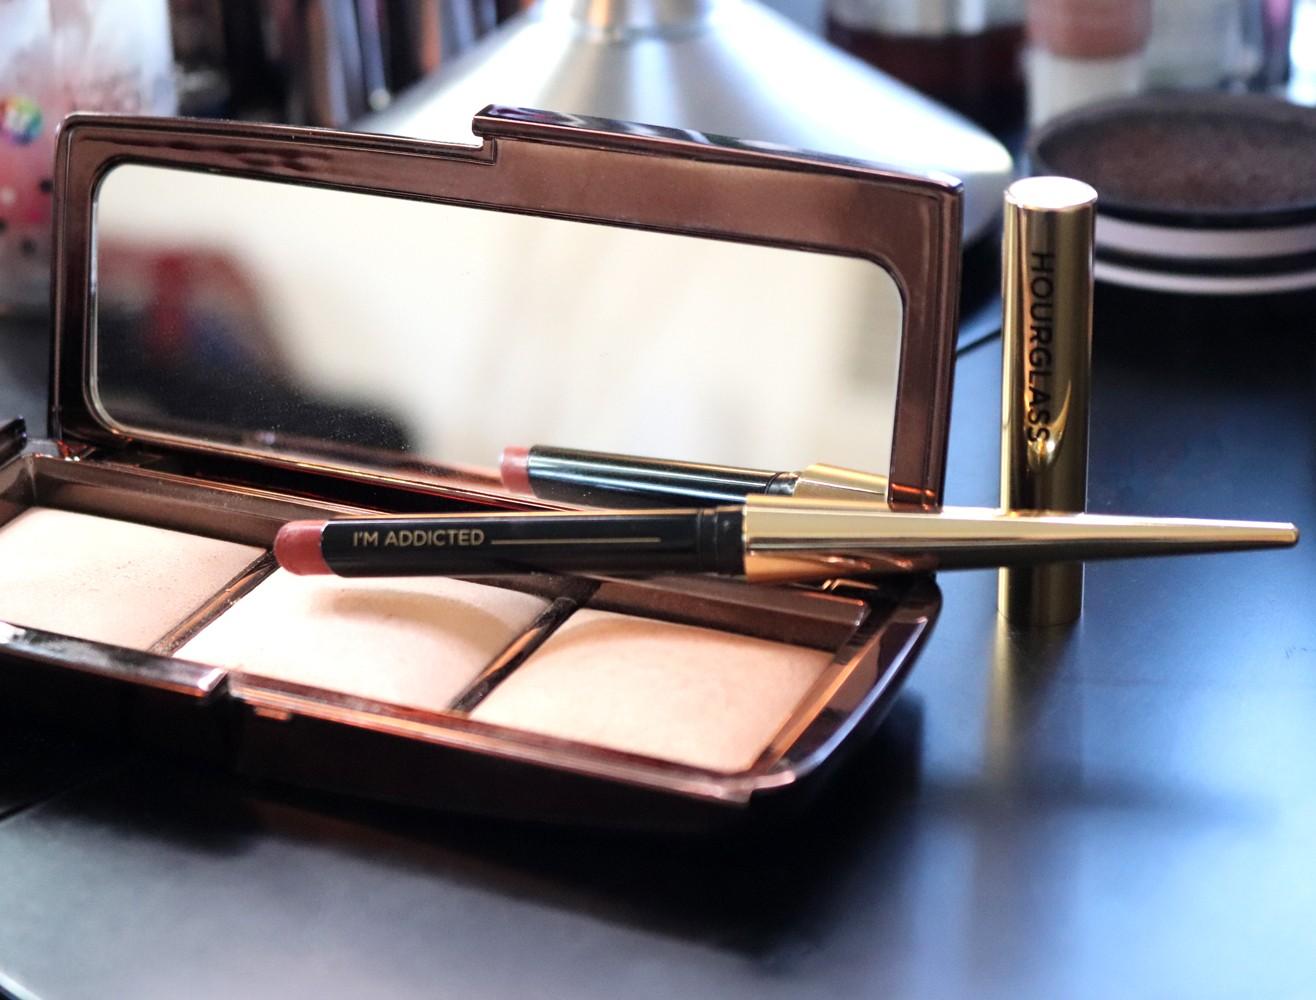 Hourglass cosmetics going vegan by popular Las Vegas beauty blogger My Beauty Bunny